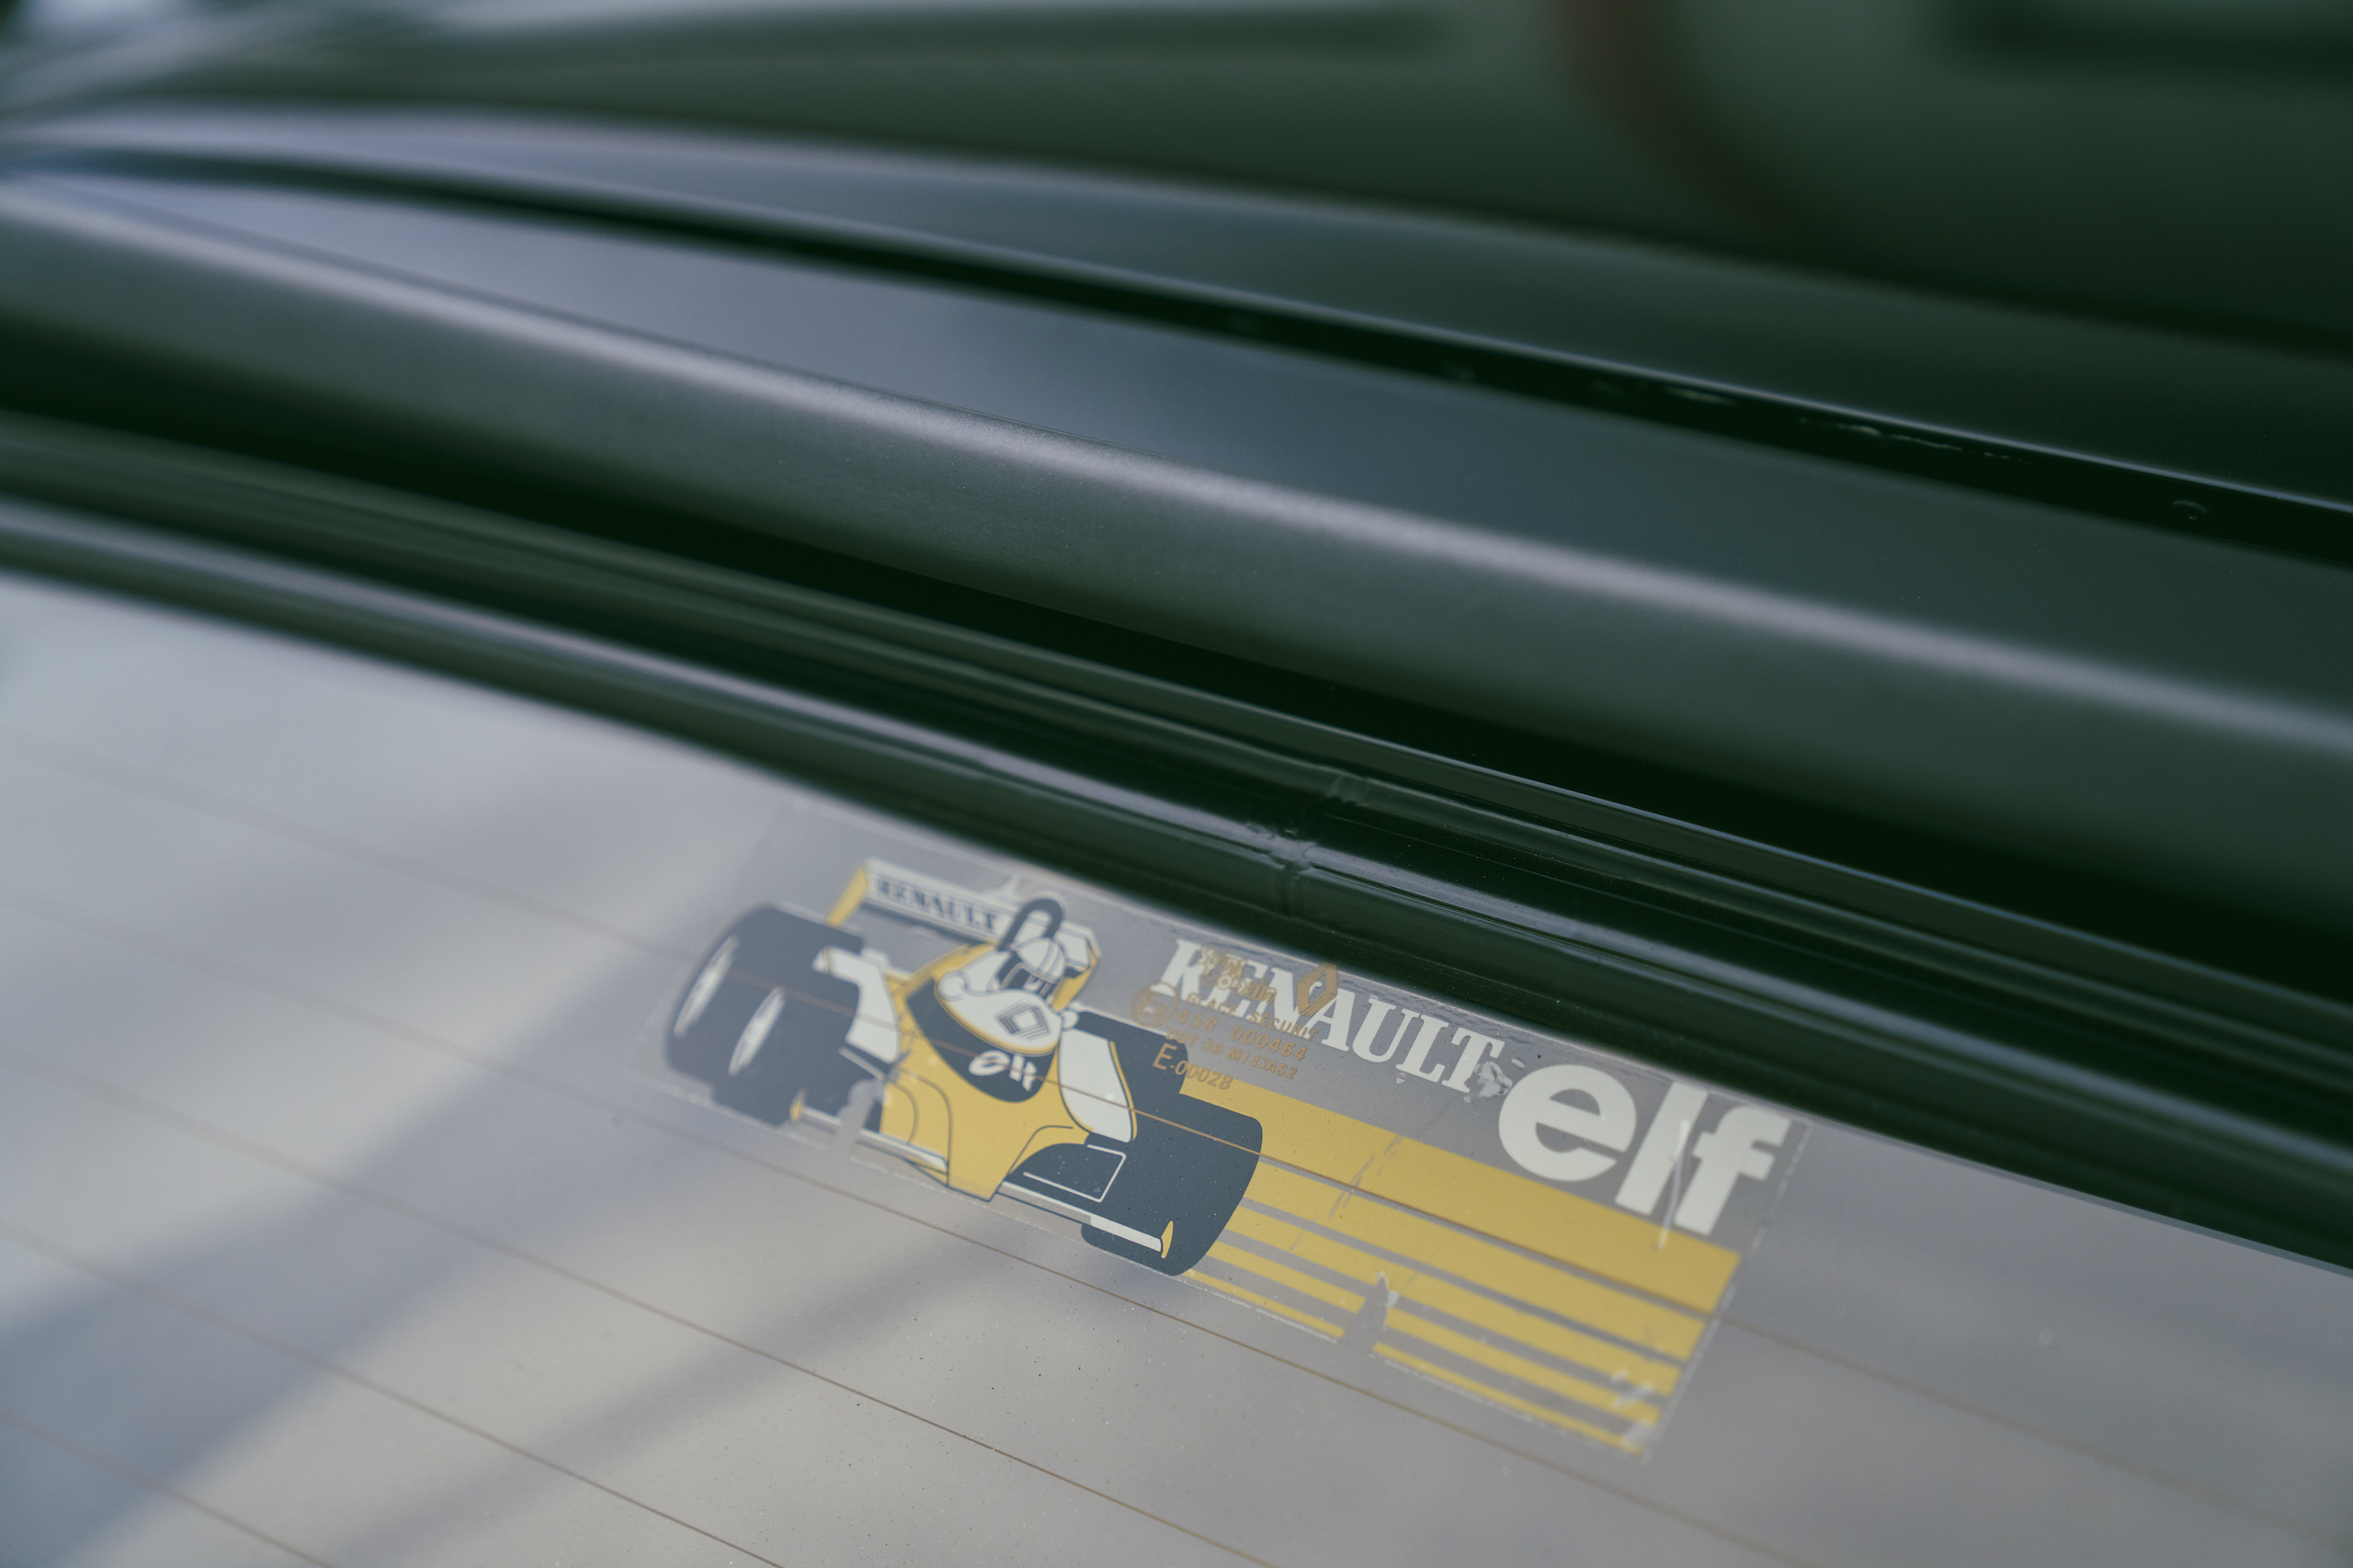 1985 Renault R5 Turbo 2 decal detail